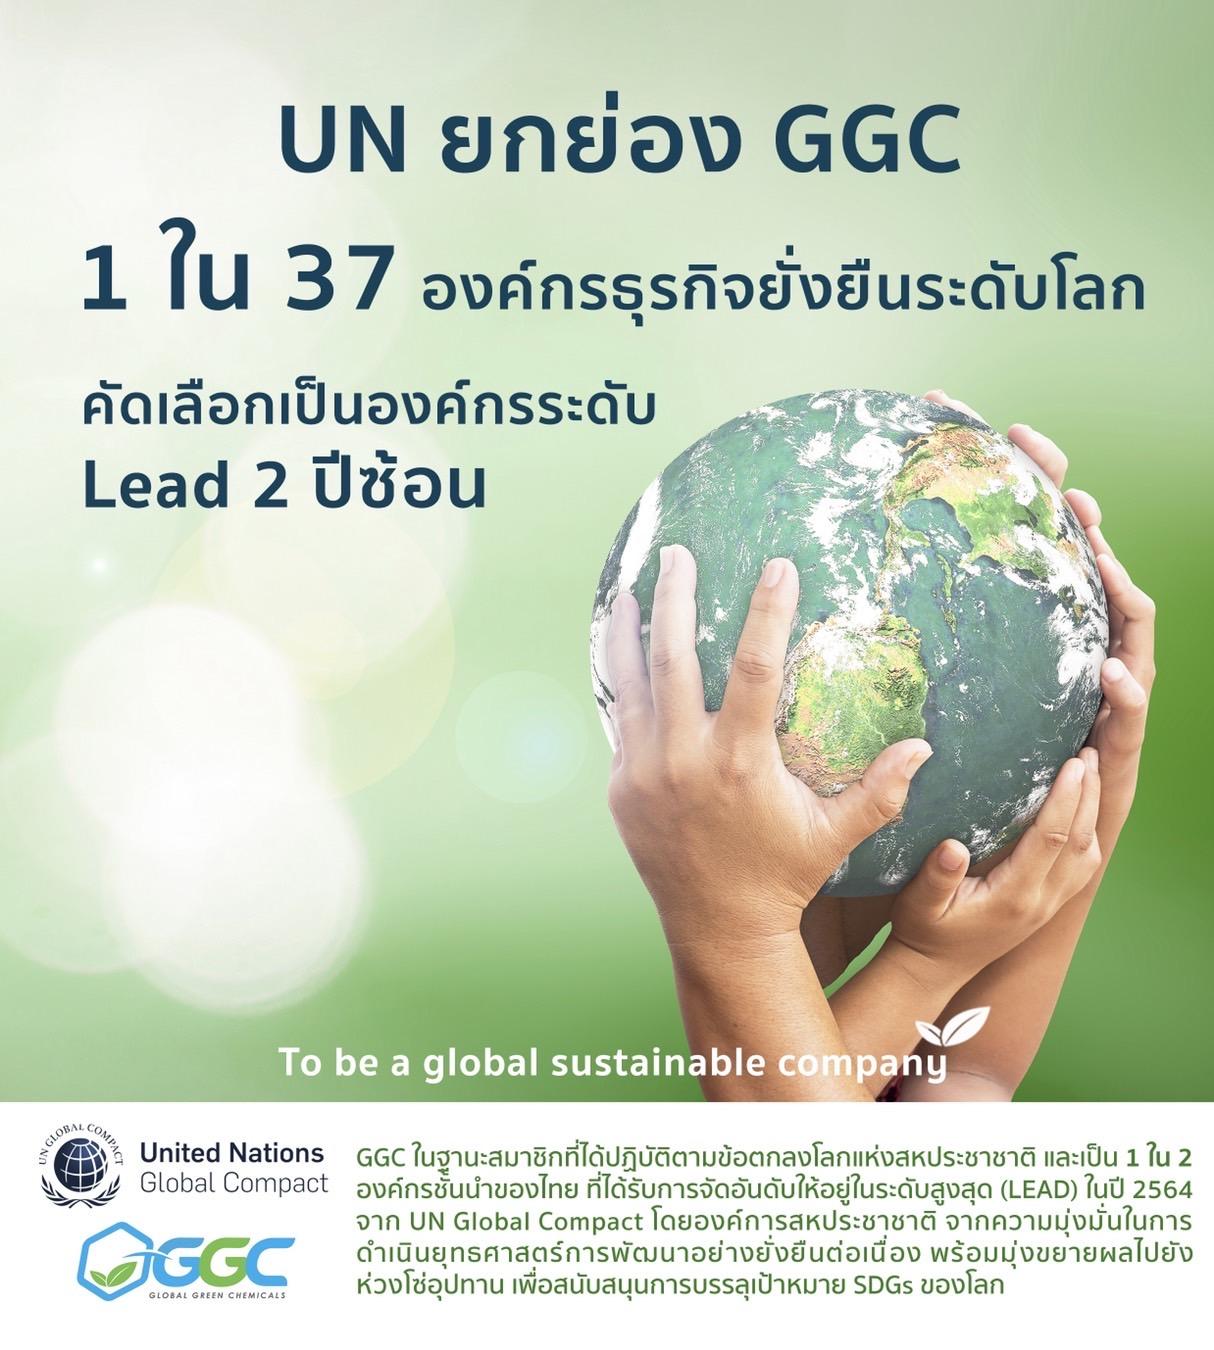 UN ยกย่อง GGC 1 ใน 37 องค์กรธุรกิจยั่งยืนระดับโลก  คัดเลือกเป็นองค์กรระดับ LEAD 2 ปีซ้อน